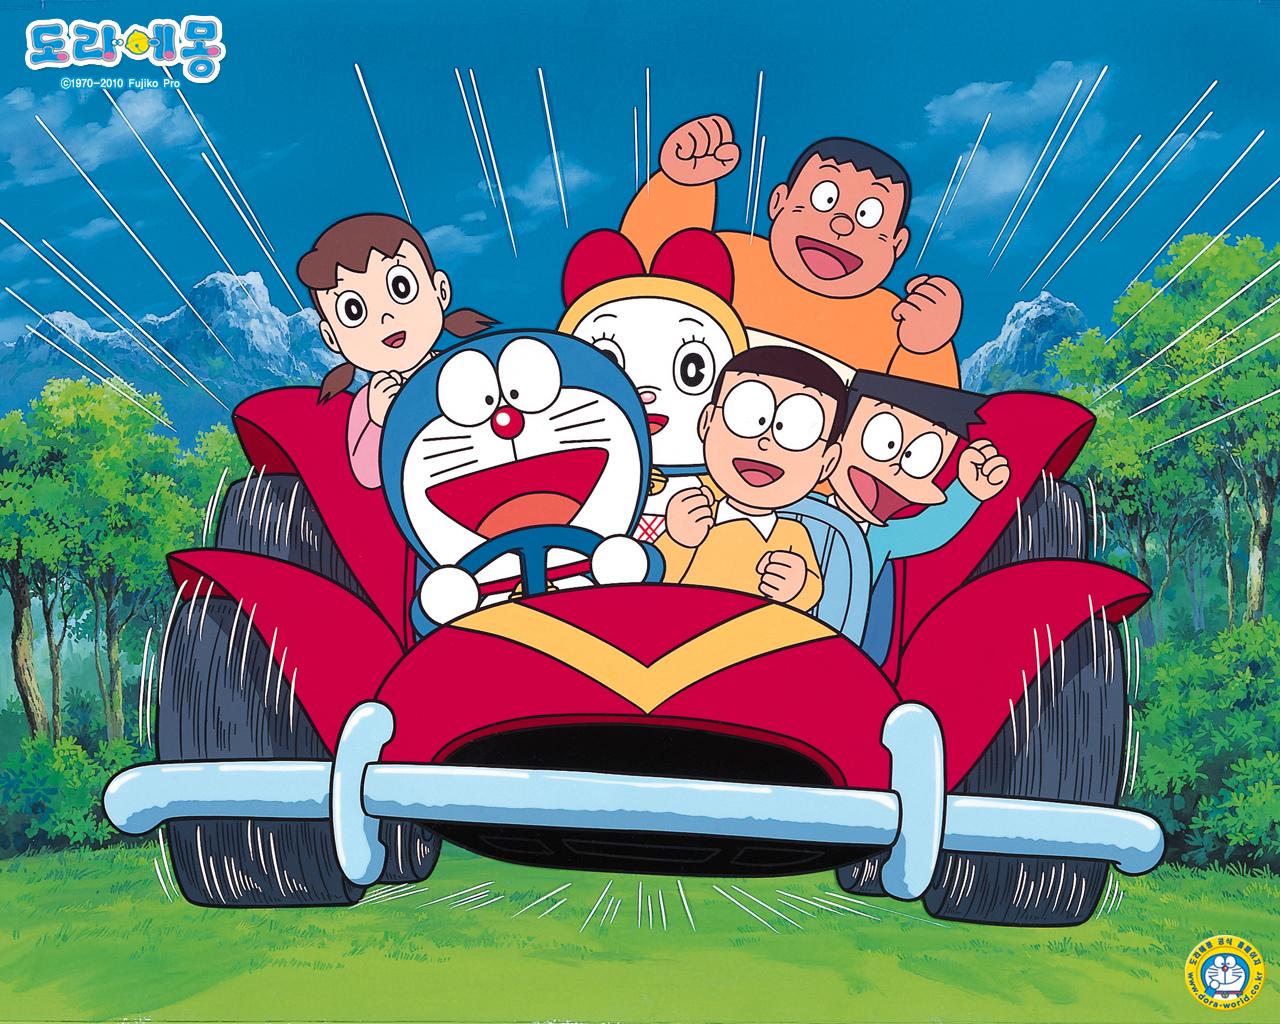 Hd Broly Wallpaper Fondos De Pantalla De Doraemon Wallpapers Hd Gratis